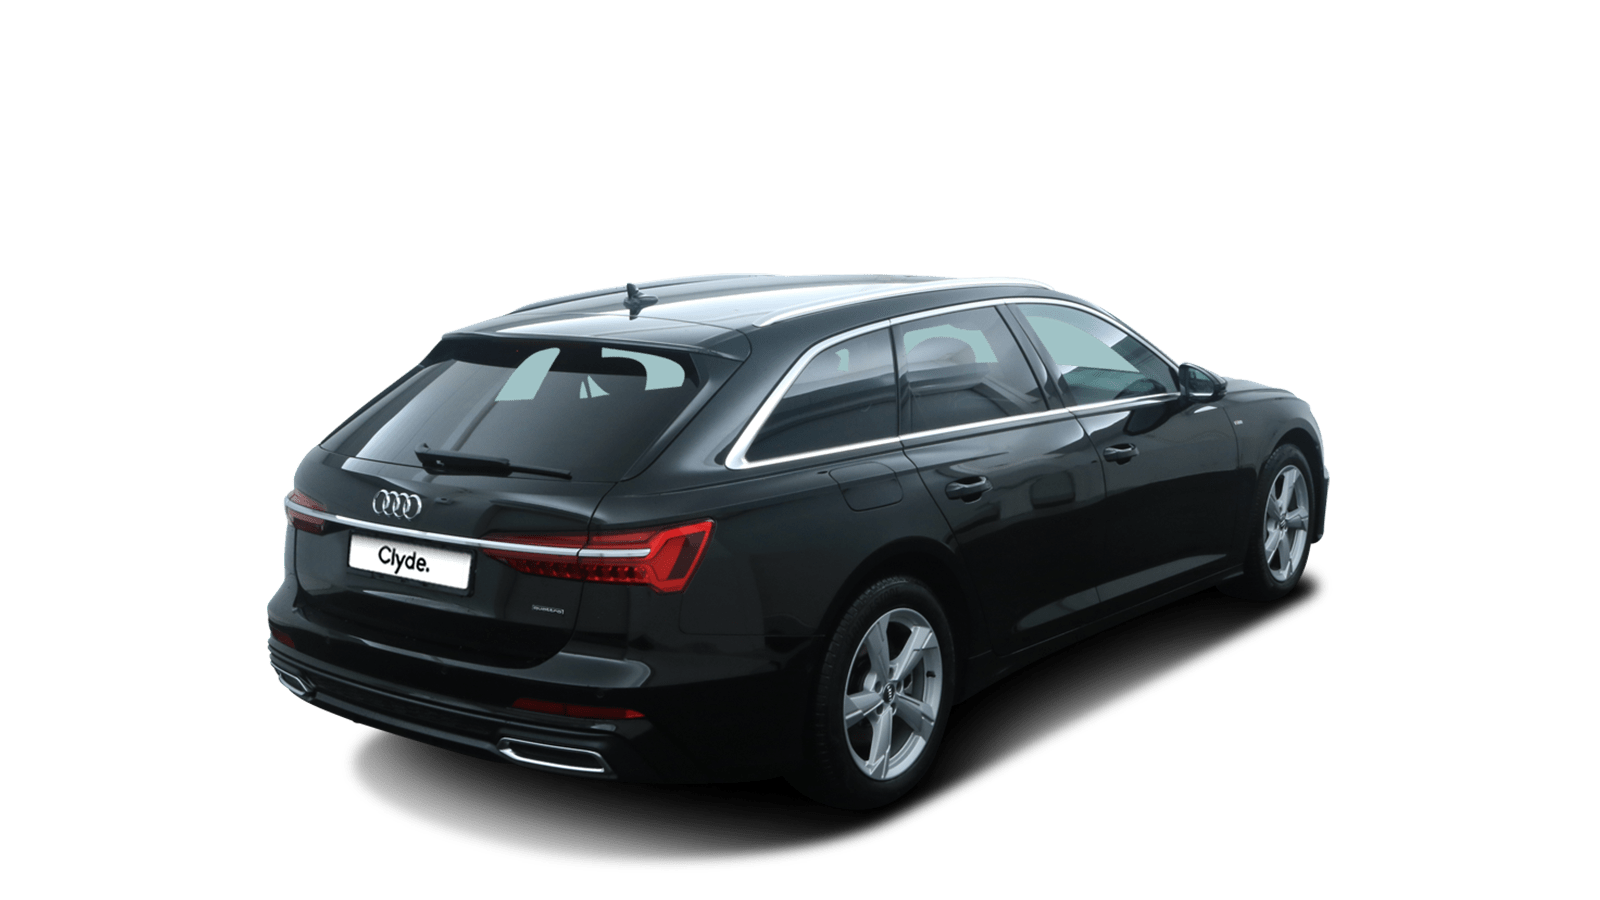 Audi A6 Avant Black back - Clyde car subscription